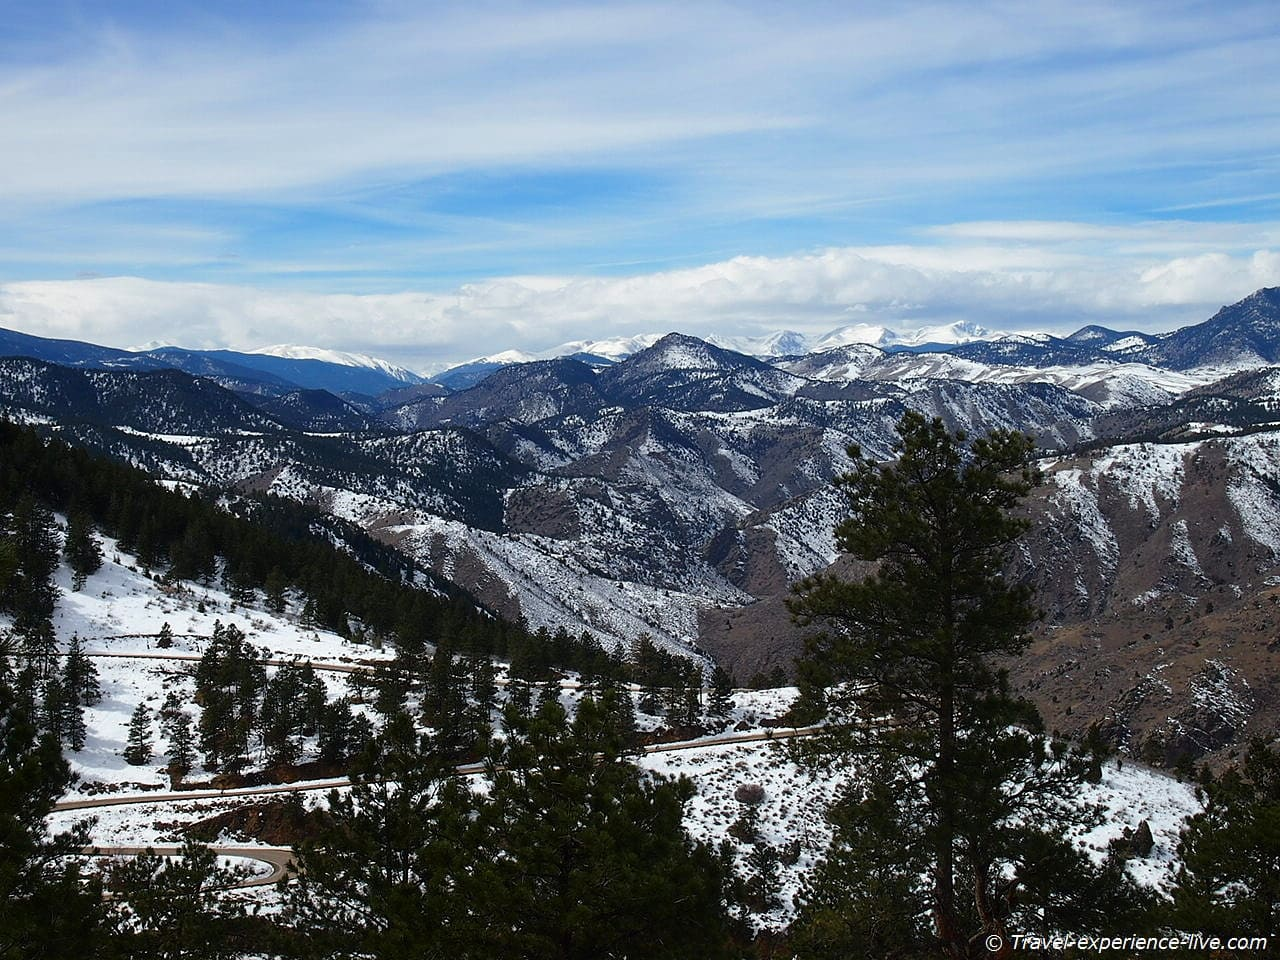 Spring Break in Colorado – Denver and the Rocky Mountains